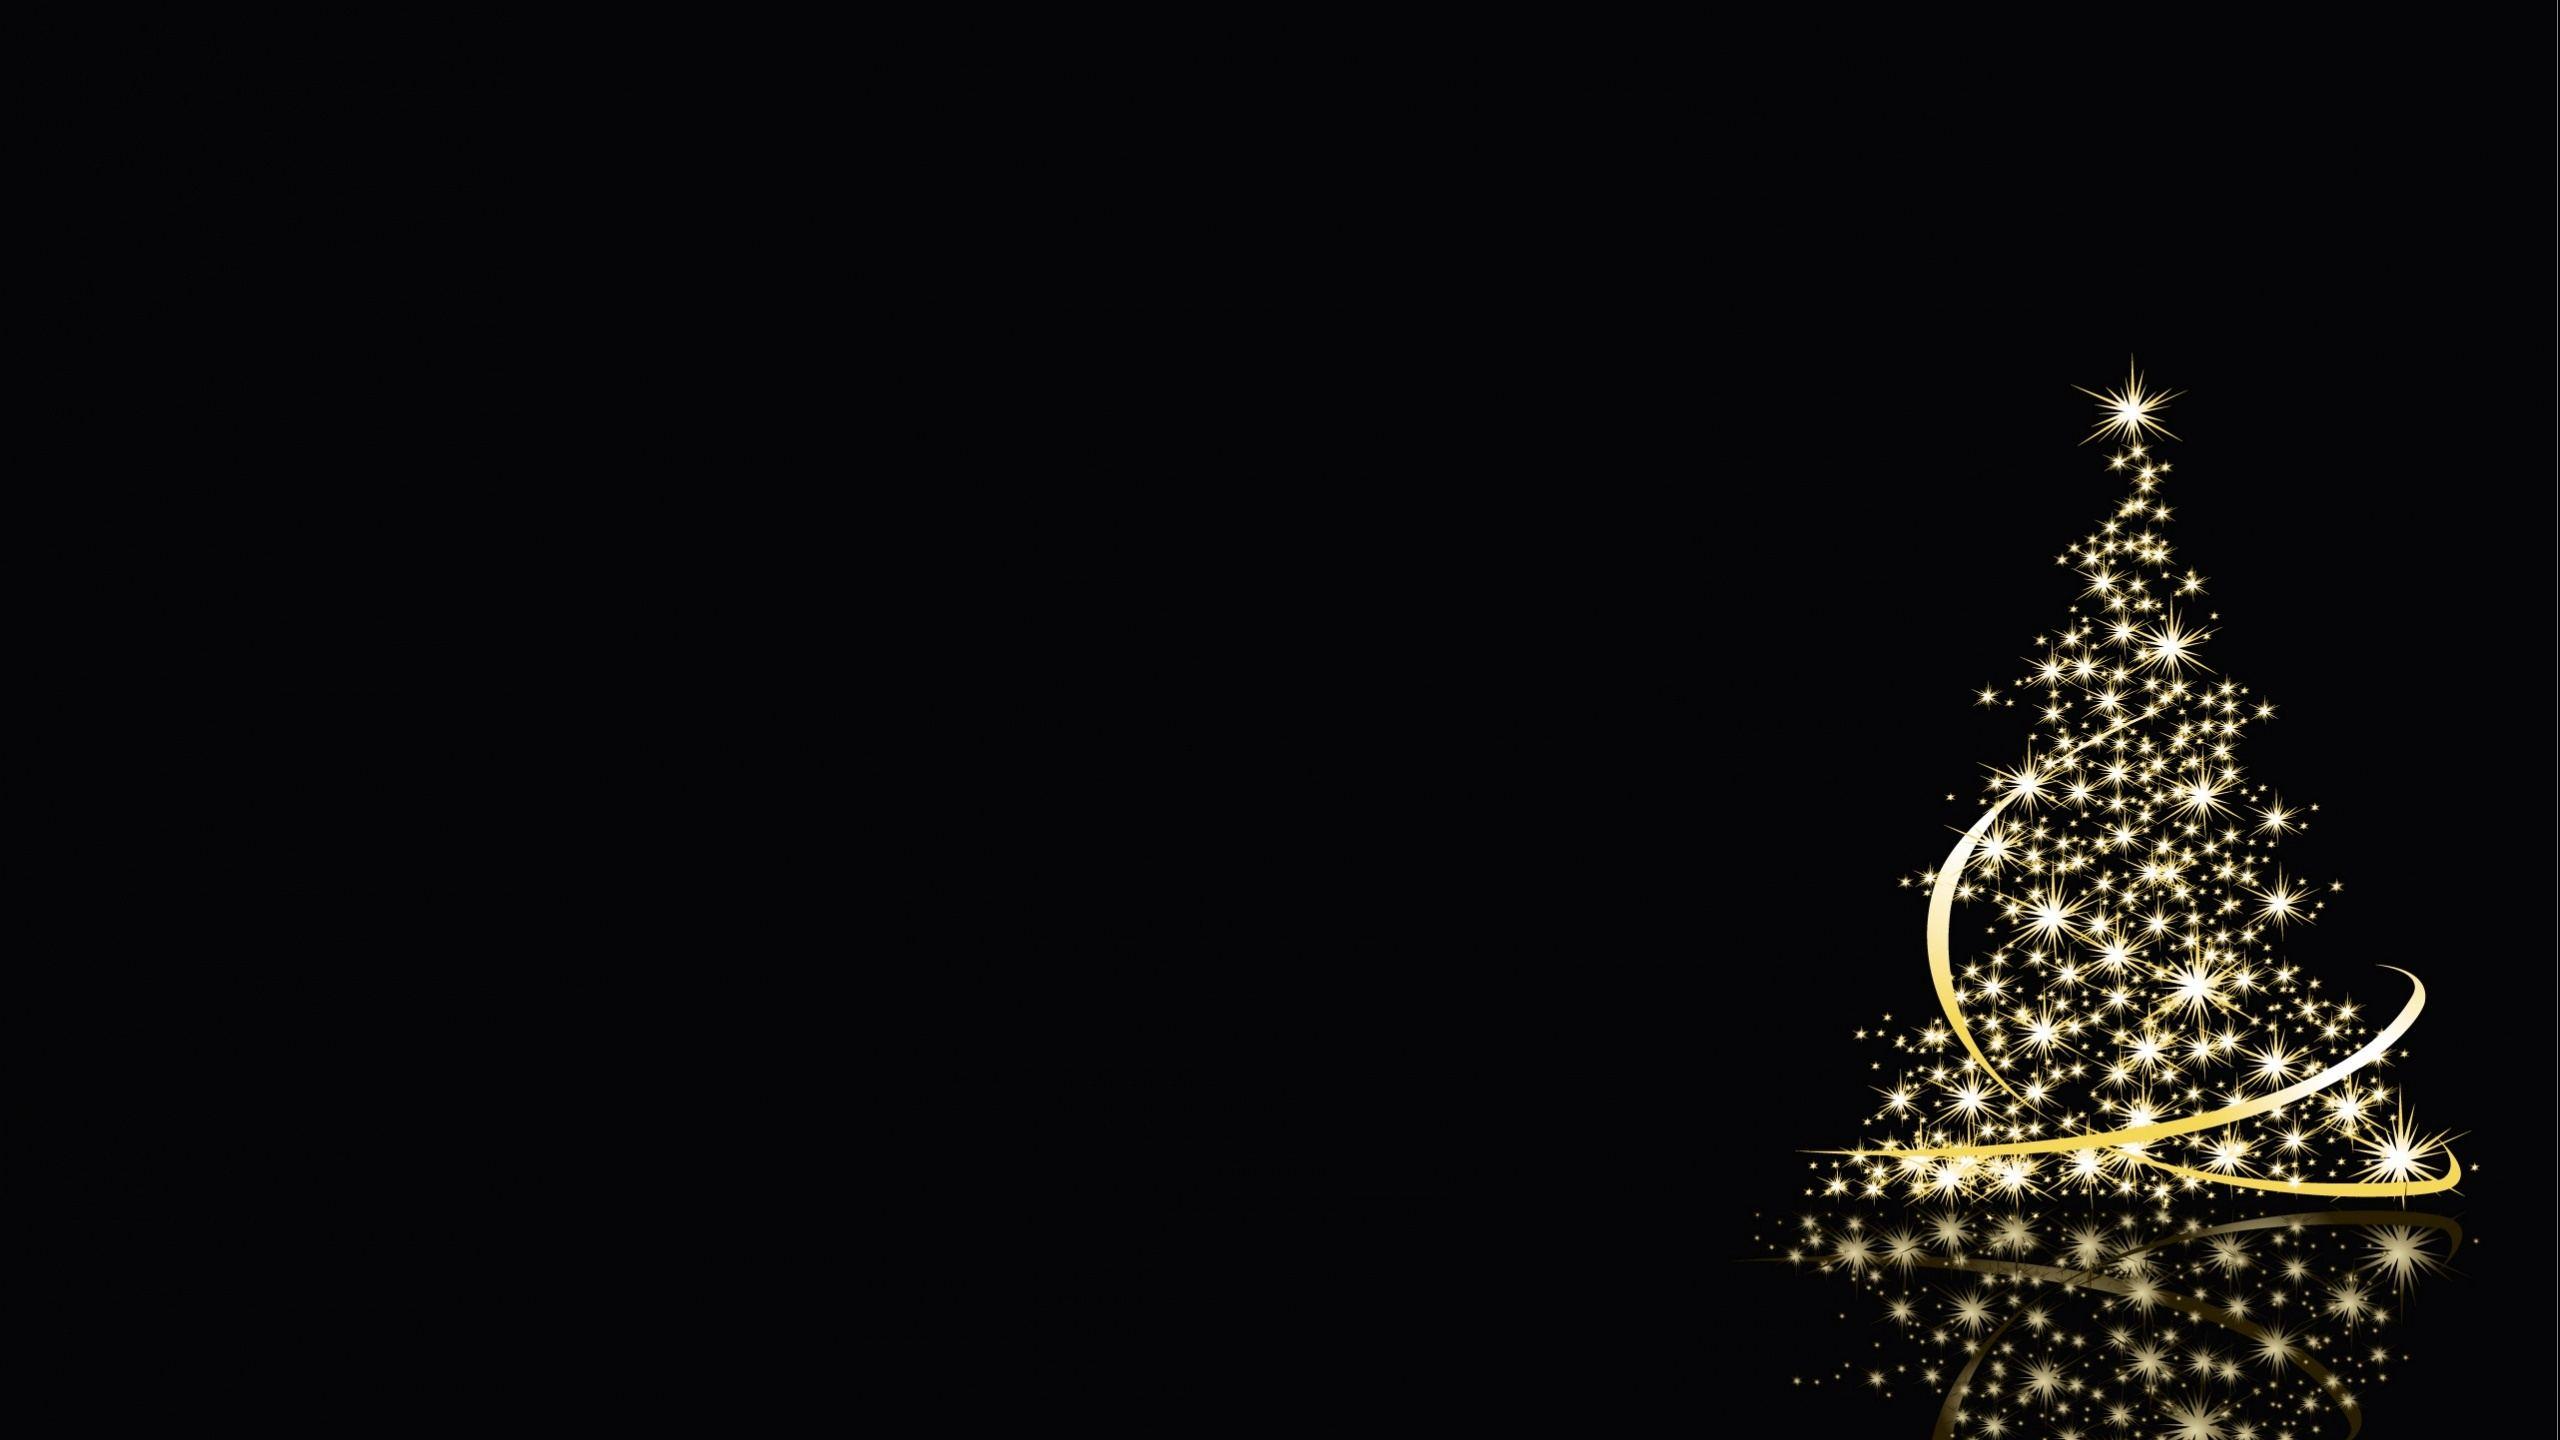 Christmas Winter Wallpaper 078